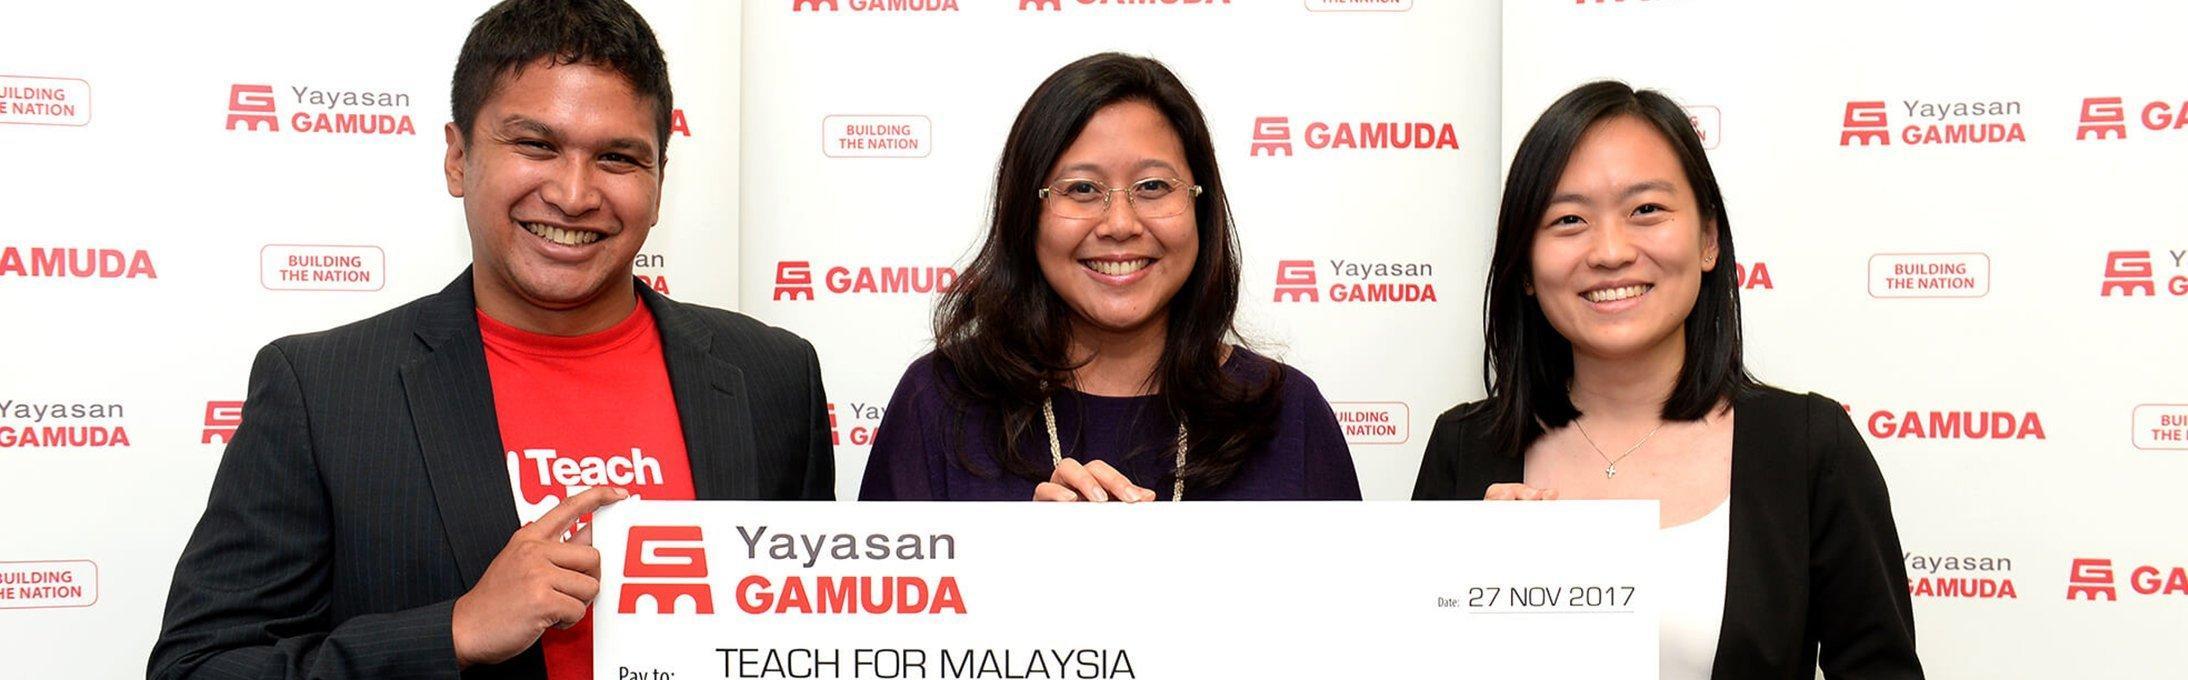 Teach For Malaysia Gamuda Berhad